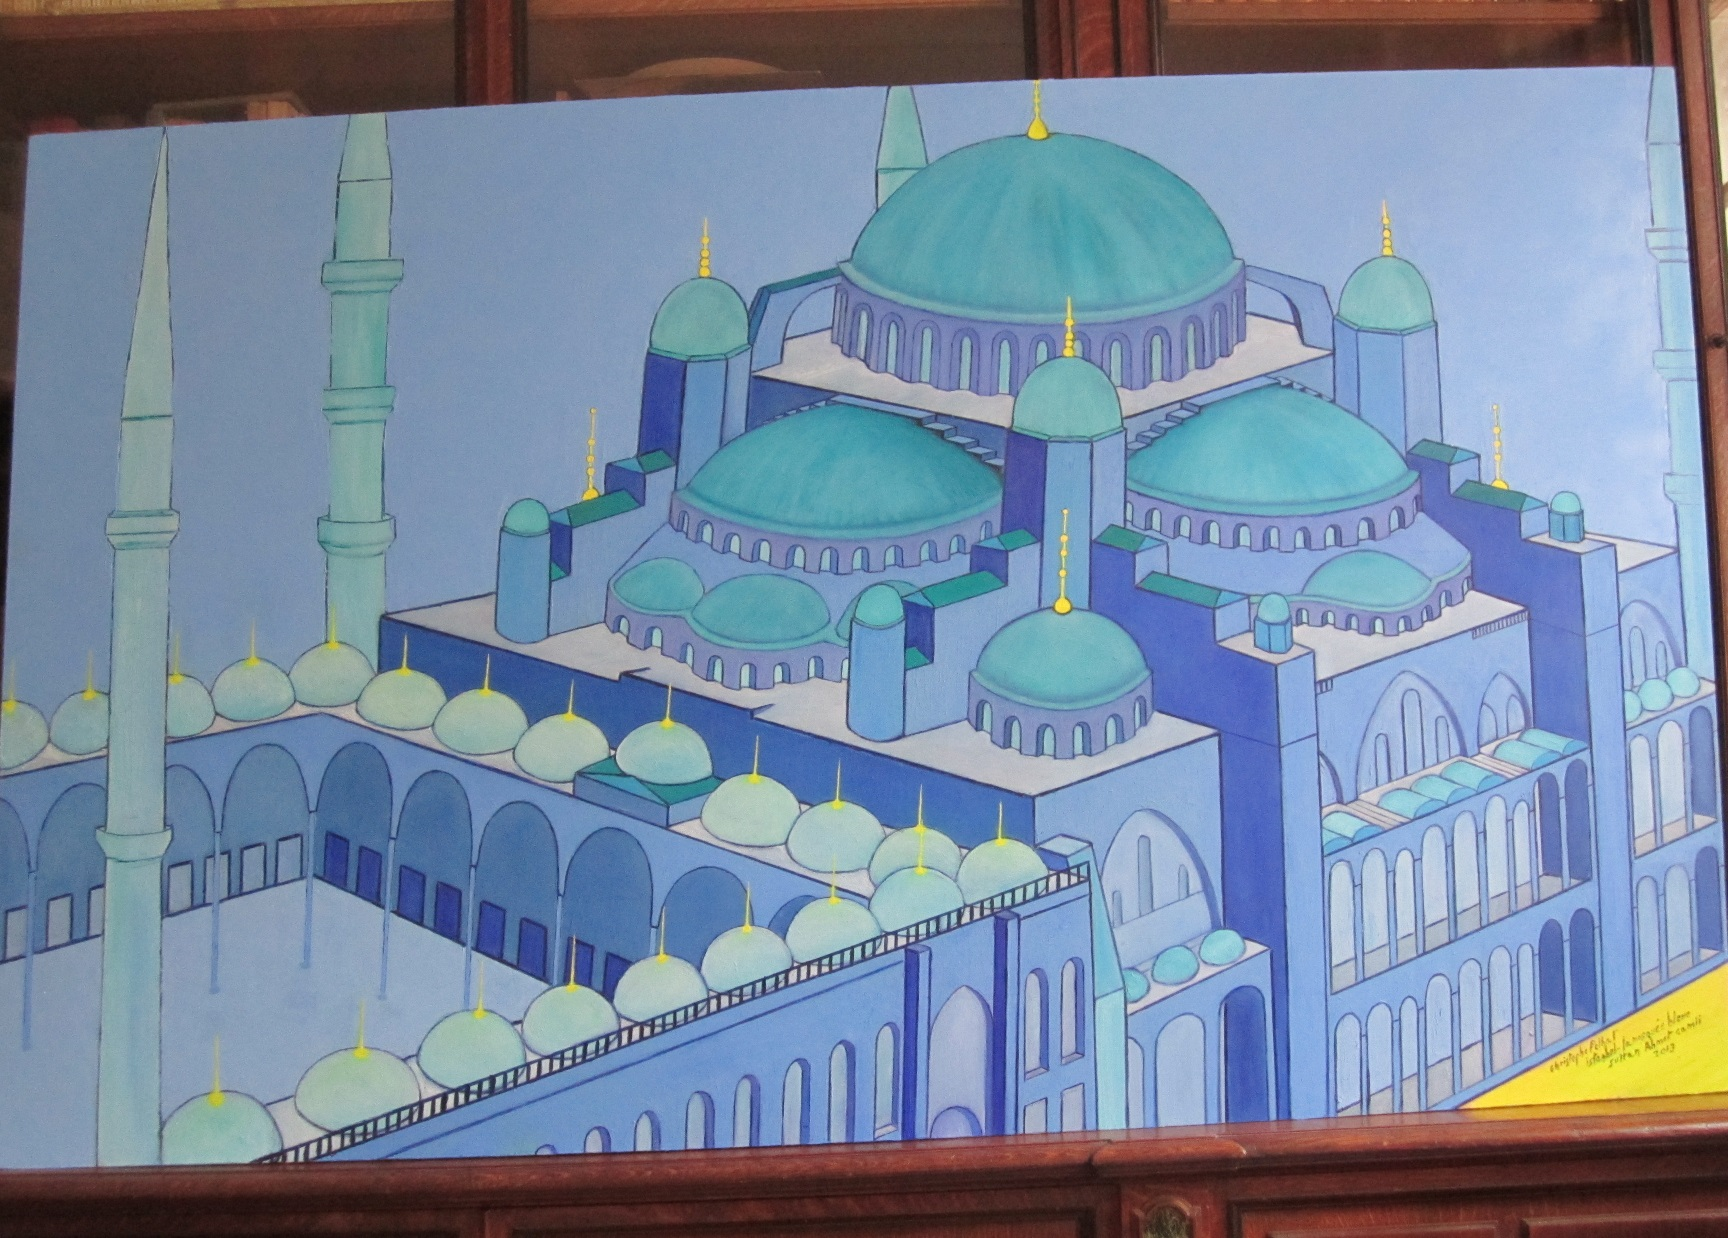 Mosquée Bleue - Blue Mosque - Sutamahmet Camii - Christophe Pelhat